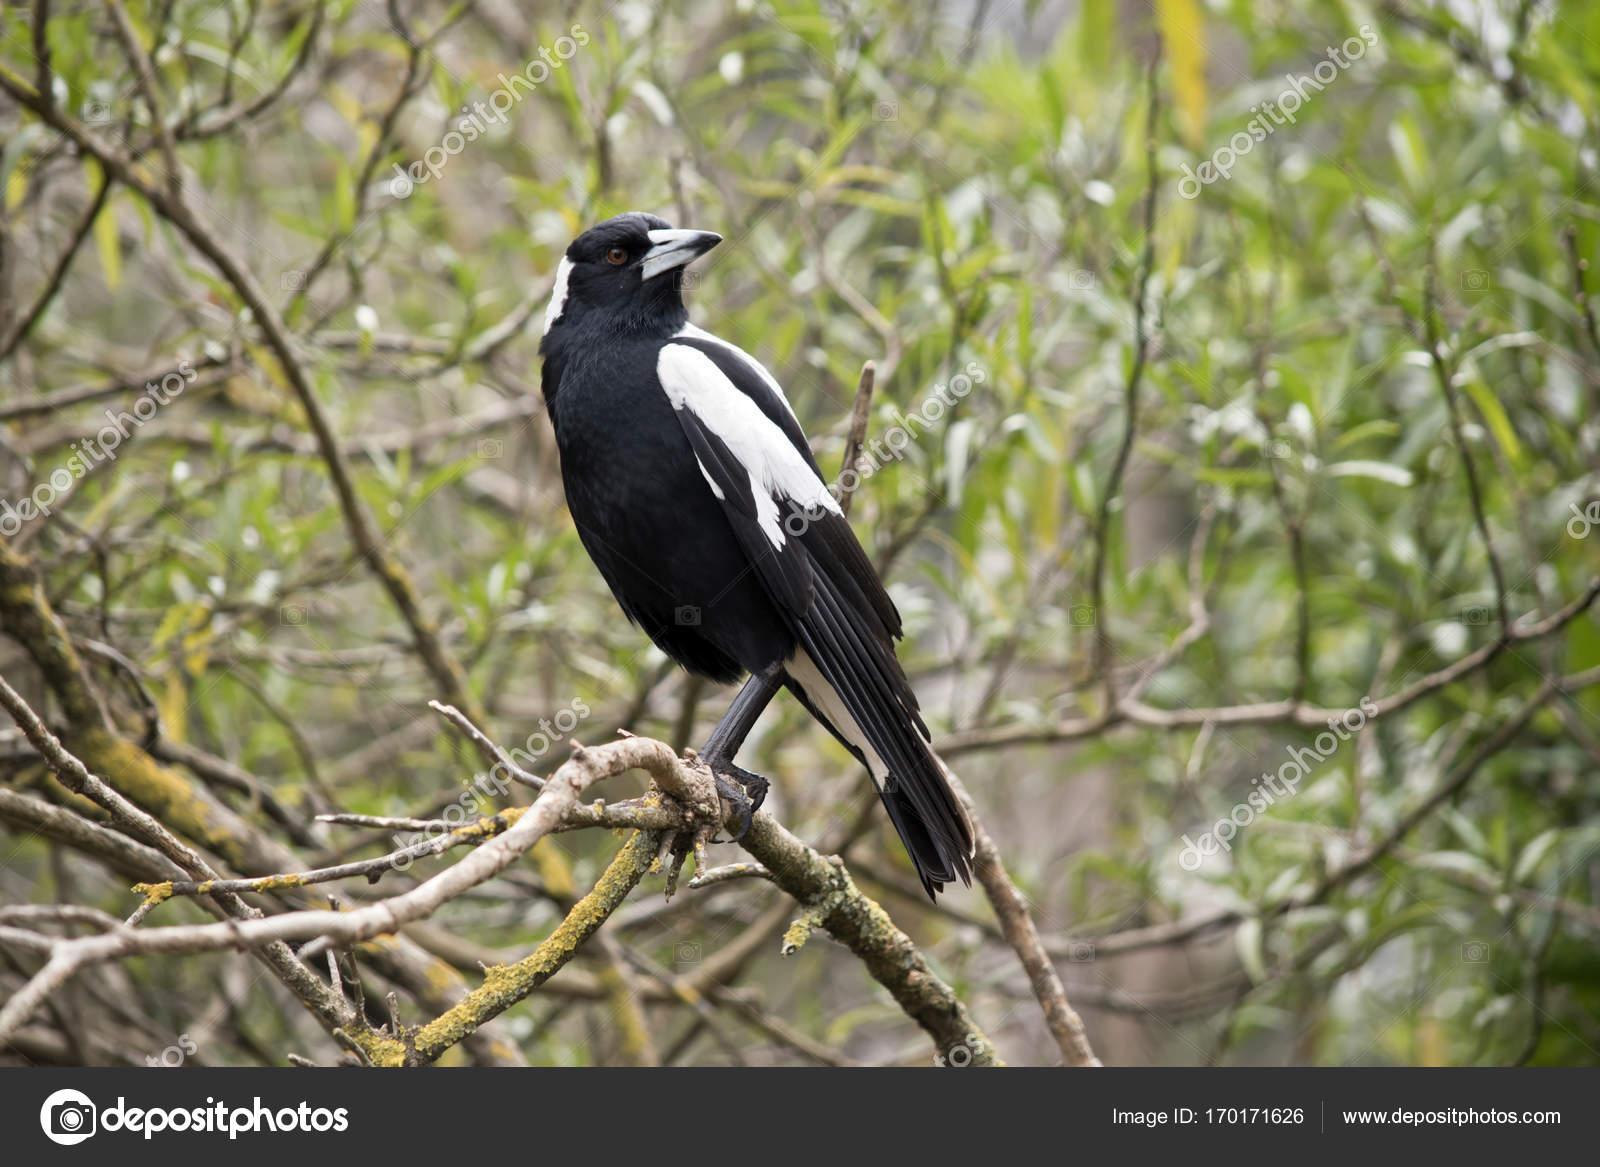 Aves Blancas Y Negras Aves Urraca Australiana Foto De Stock